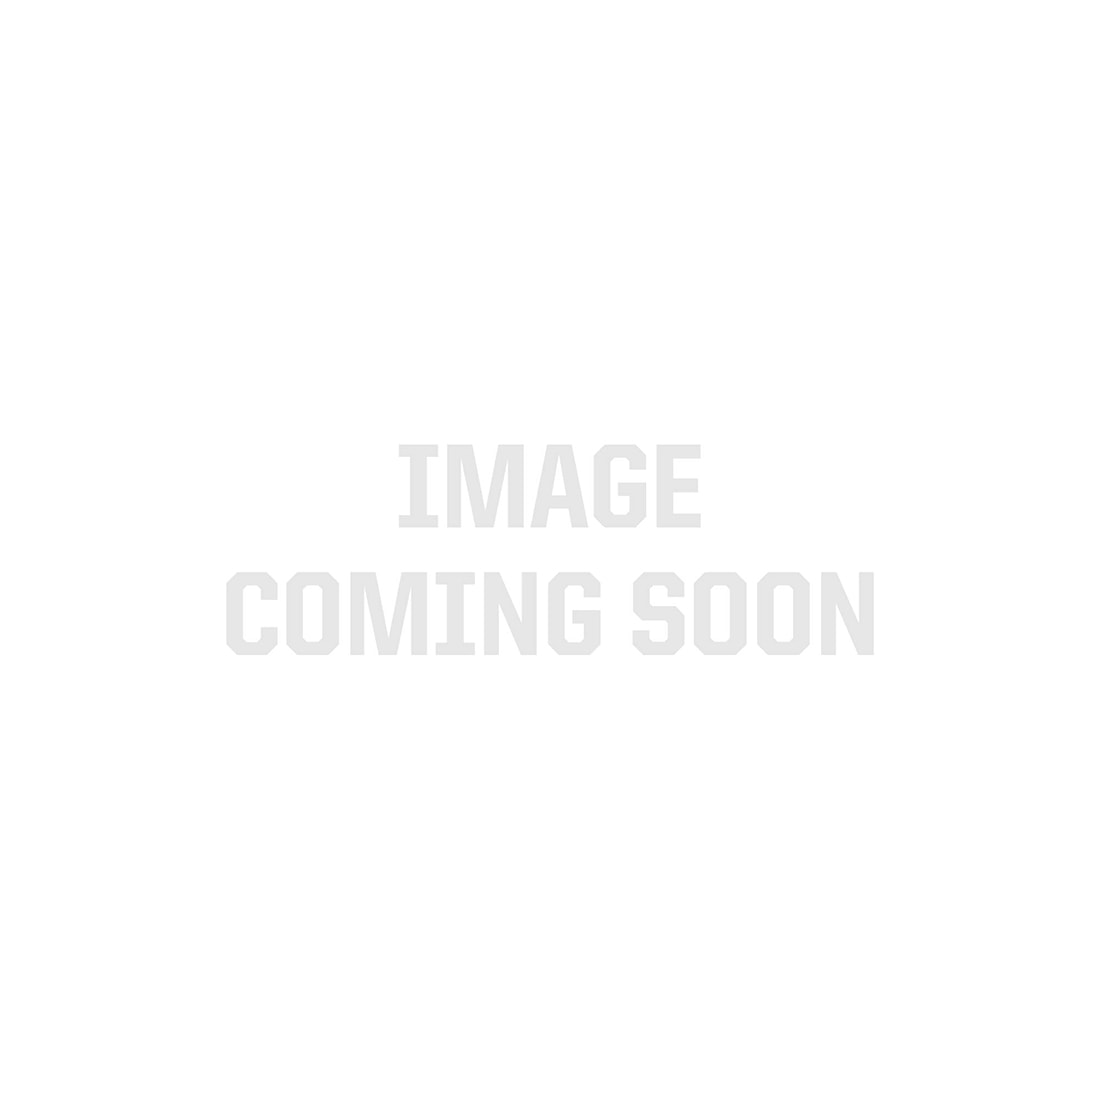 Very Warm White 5050 Single Row CurrentControl LED Strip Light, 60/m, 12mm wide, Sample Kit